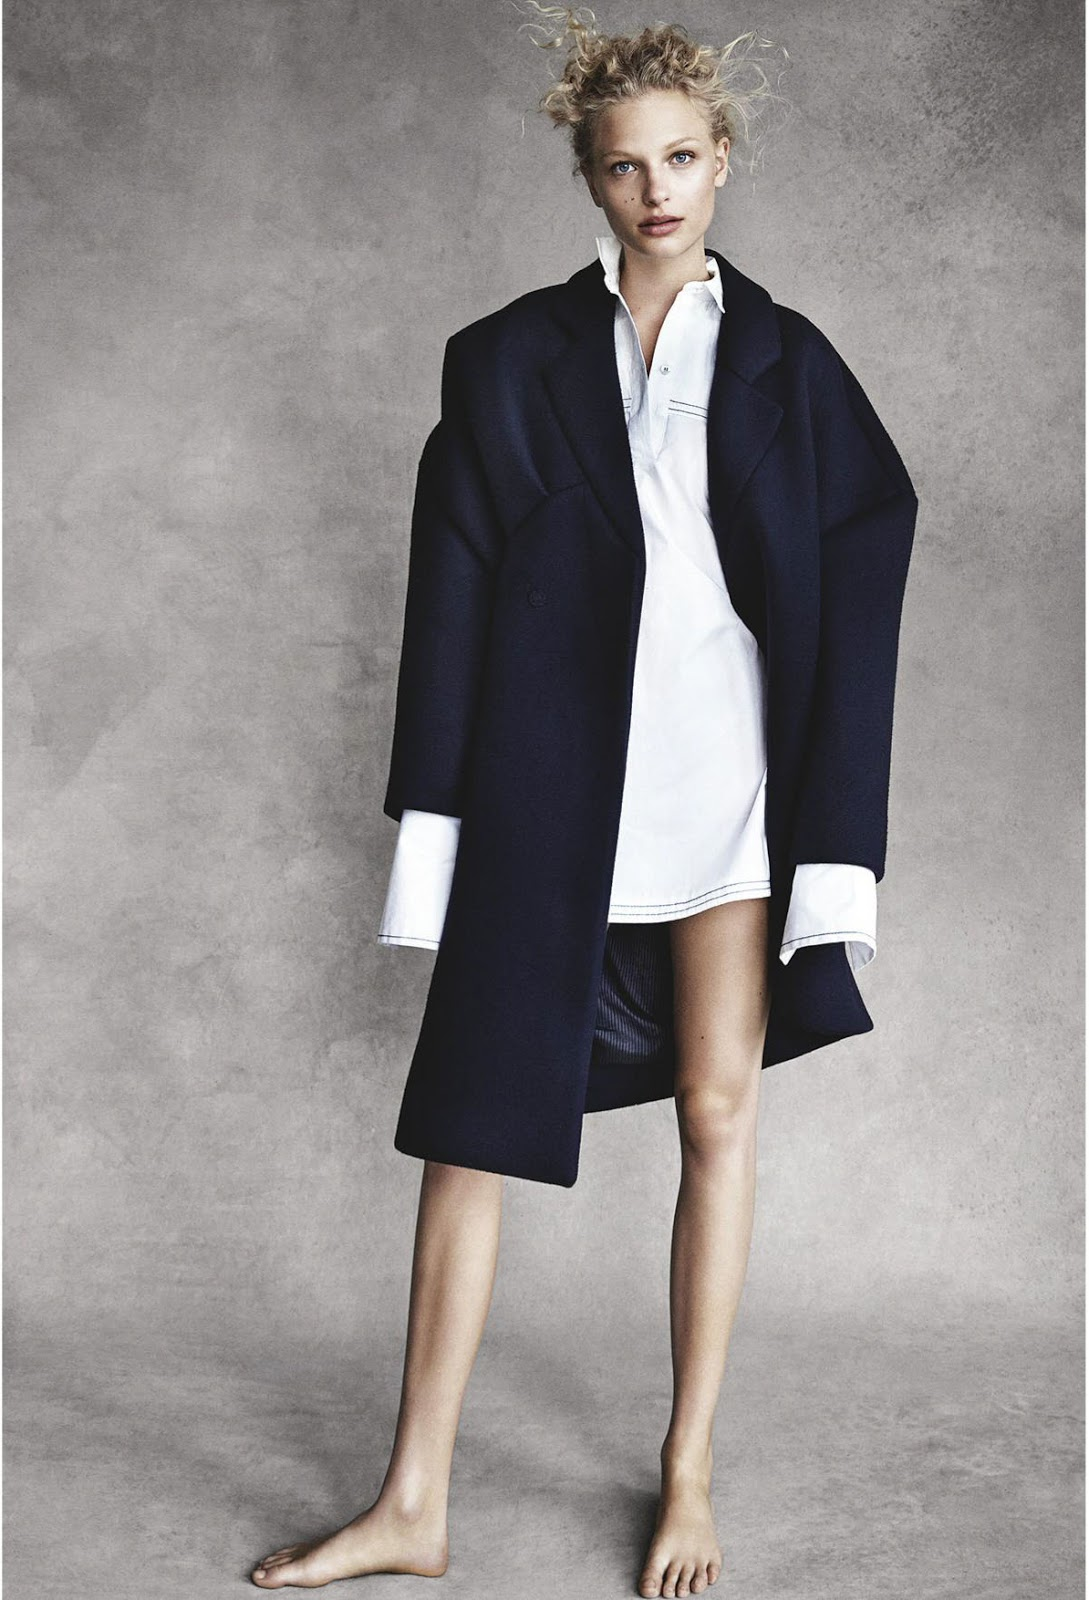 Frederikke Sofie In Vogue Australia October 2016 By